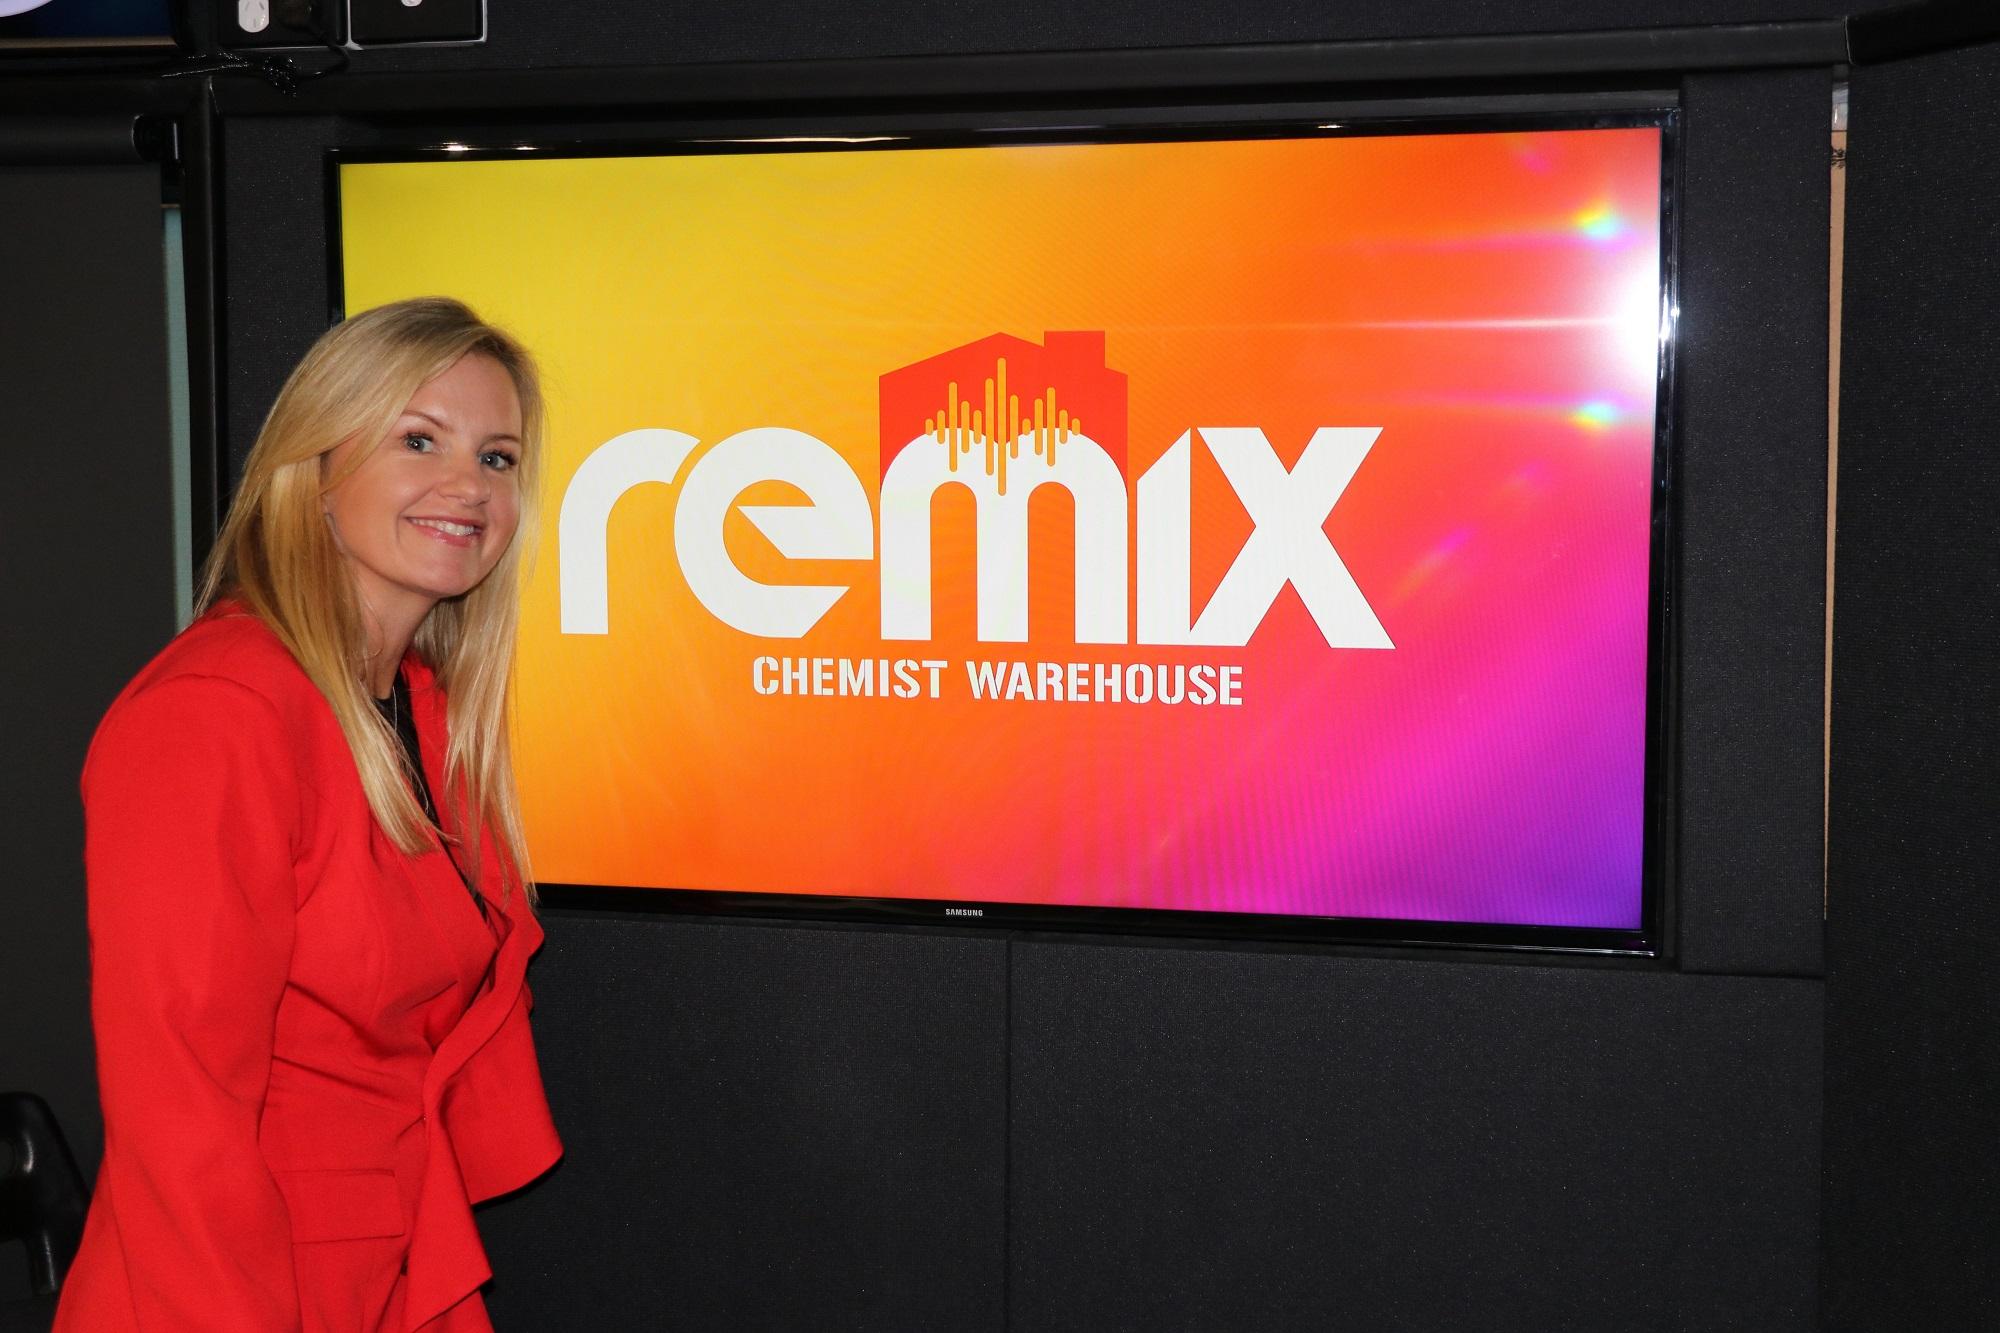 Zoe Sheridan - Chemist Warehouse REMIX